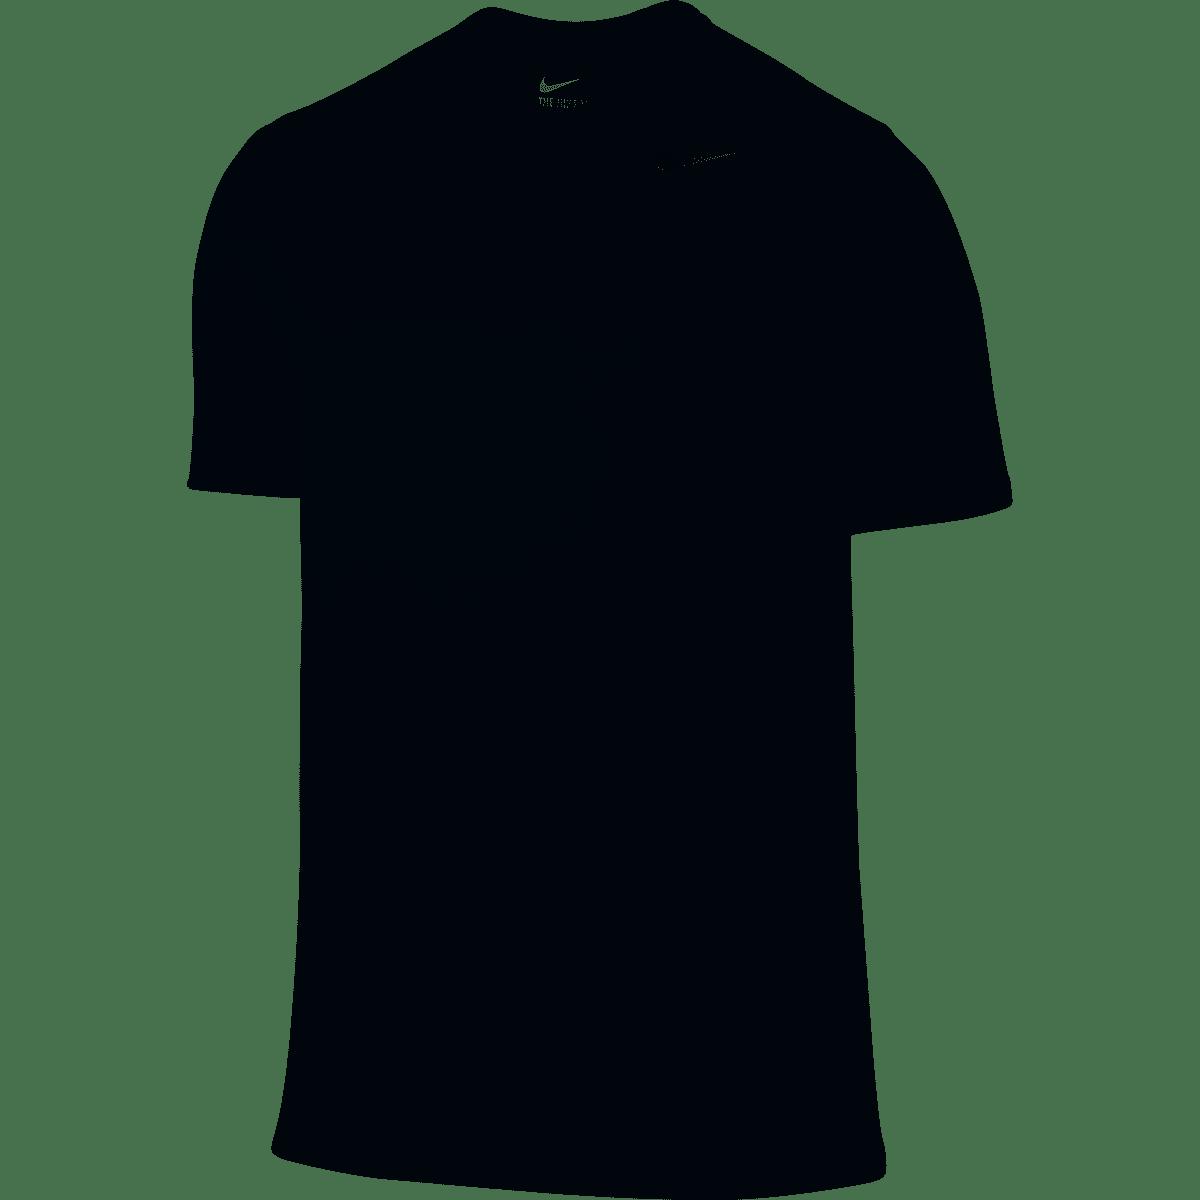 Camiseta Nike Legend 2.0 Ss Masculina - Preto  - REAL ESPORTE